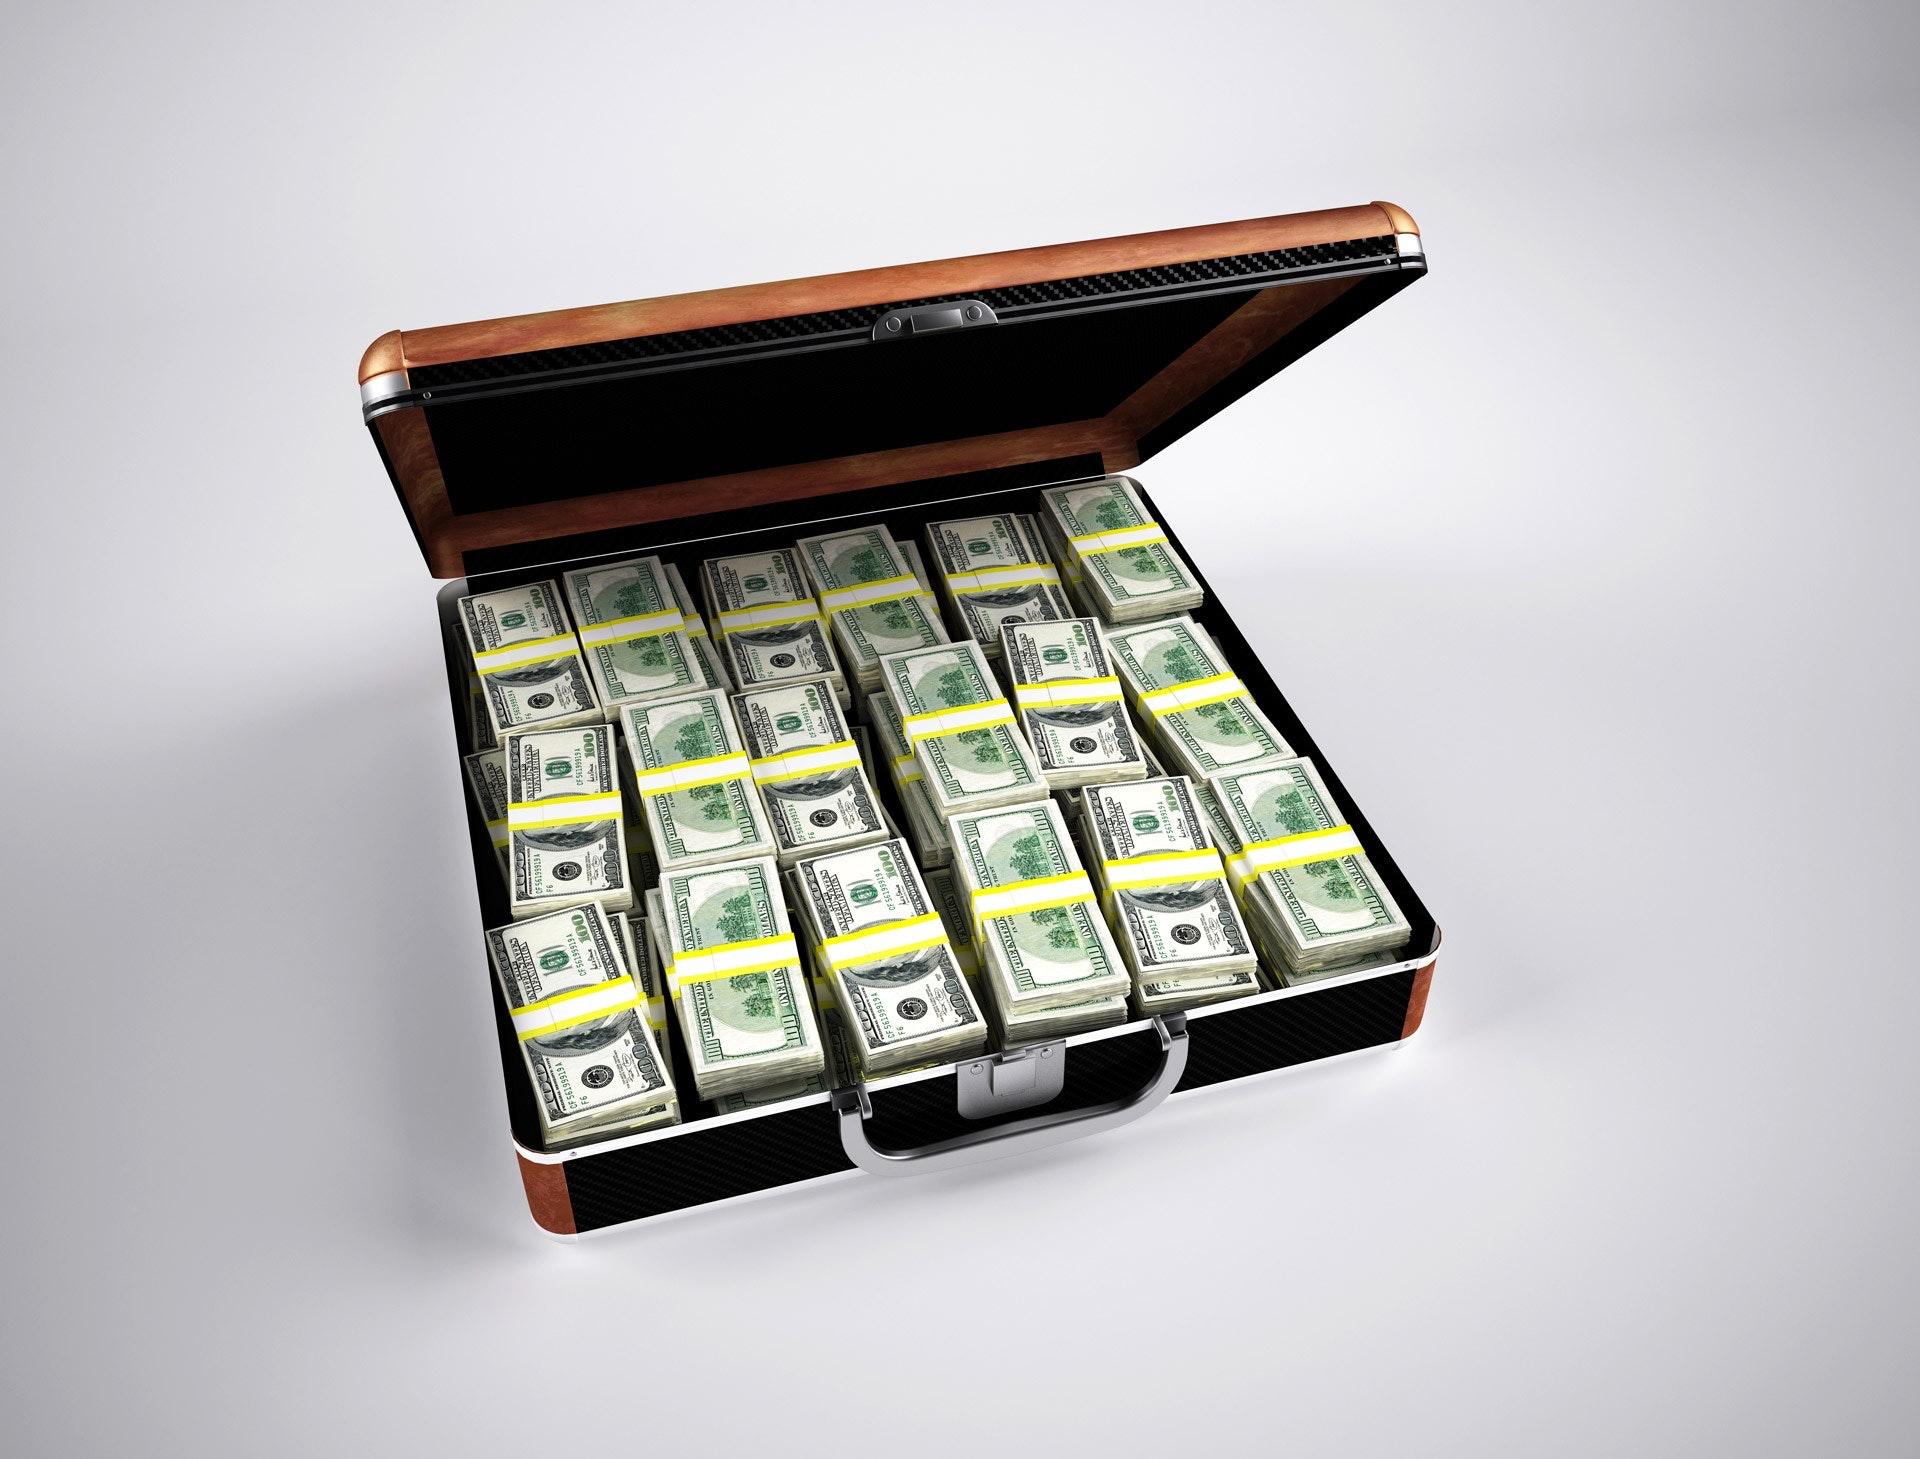 briefcase-cash-currency-68148.jpg